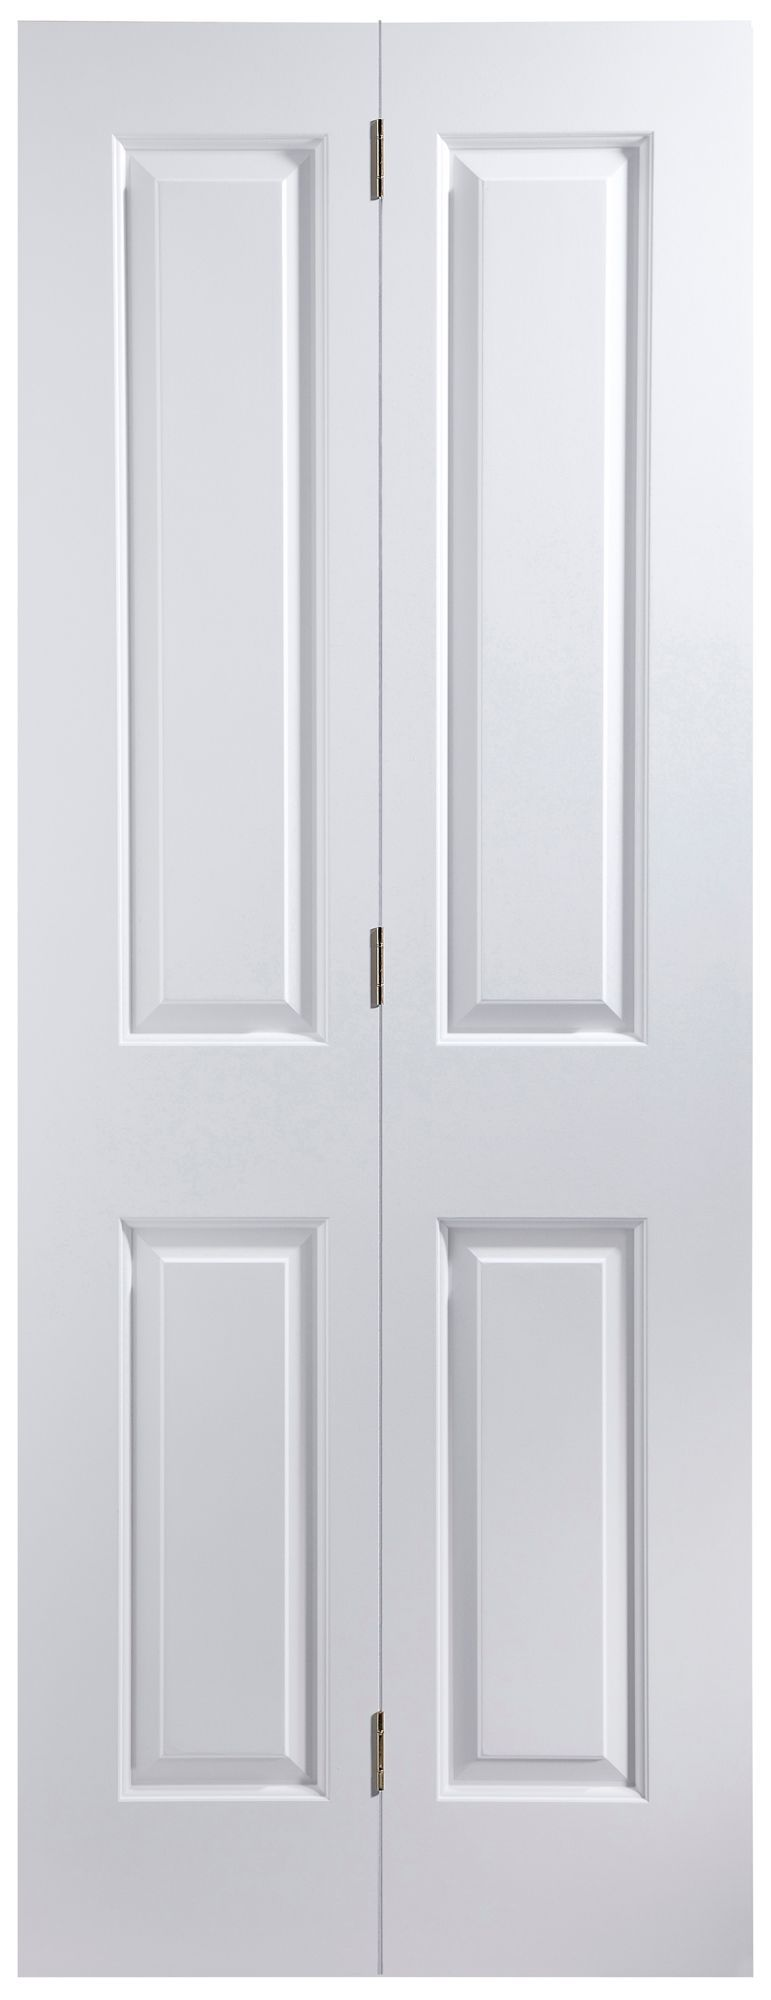 4 Panel Primed Smooth Glazed Internal Bi-fold Door, (h)1950mm (w)750mm